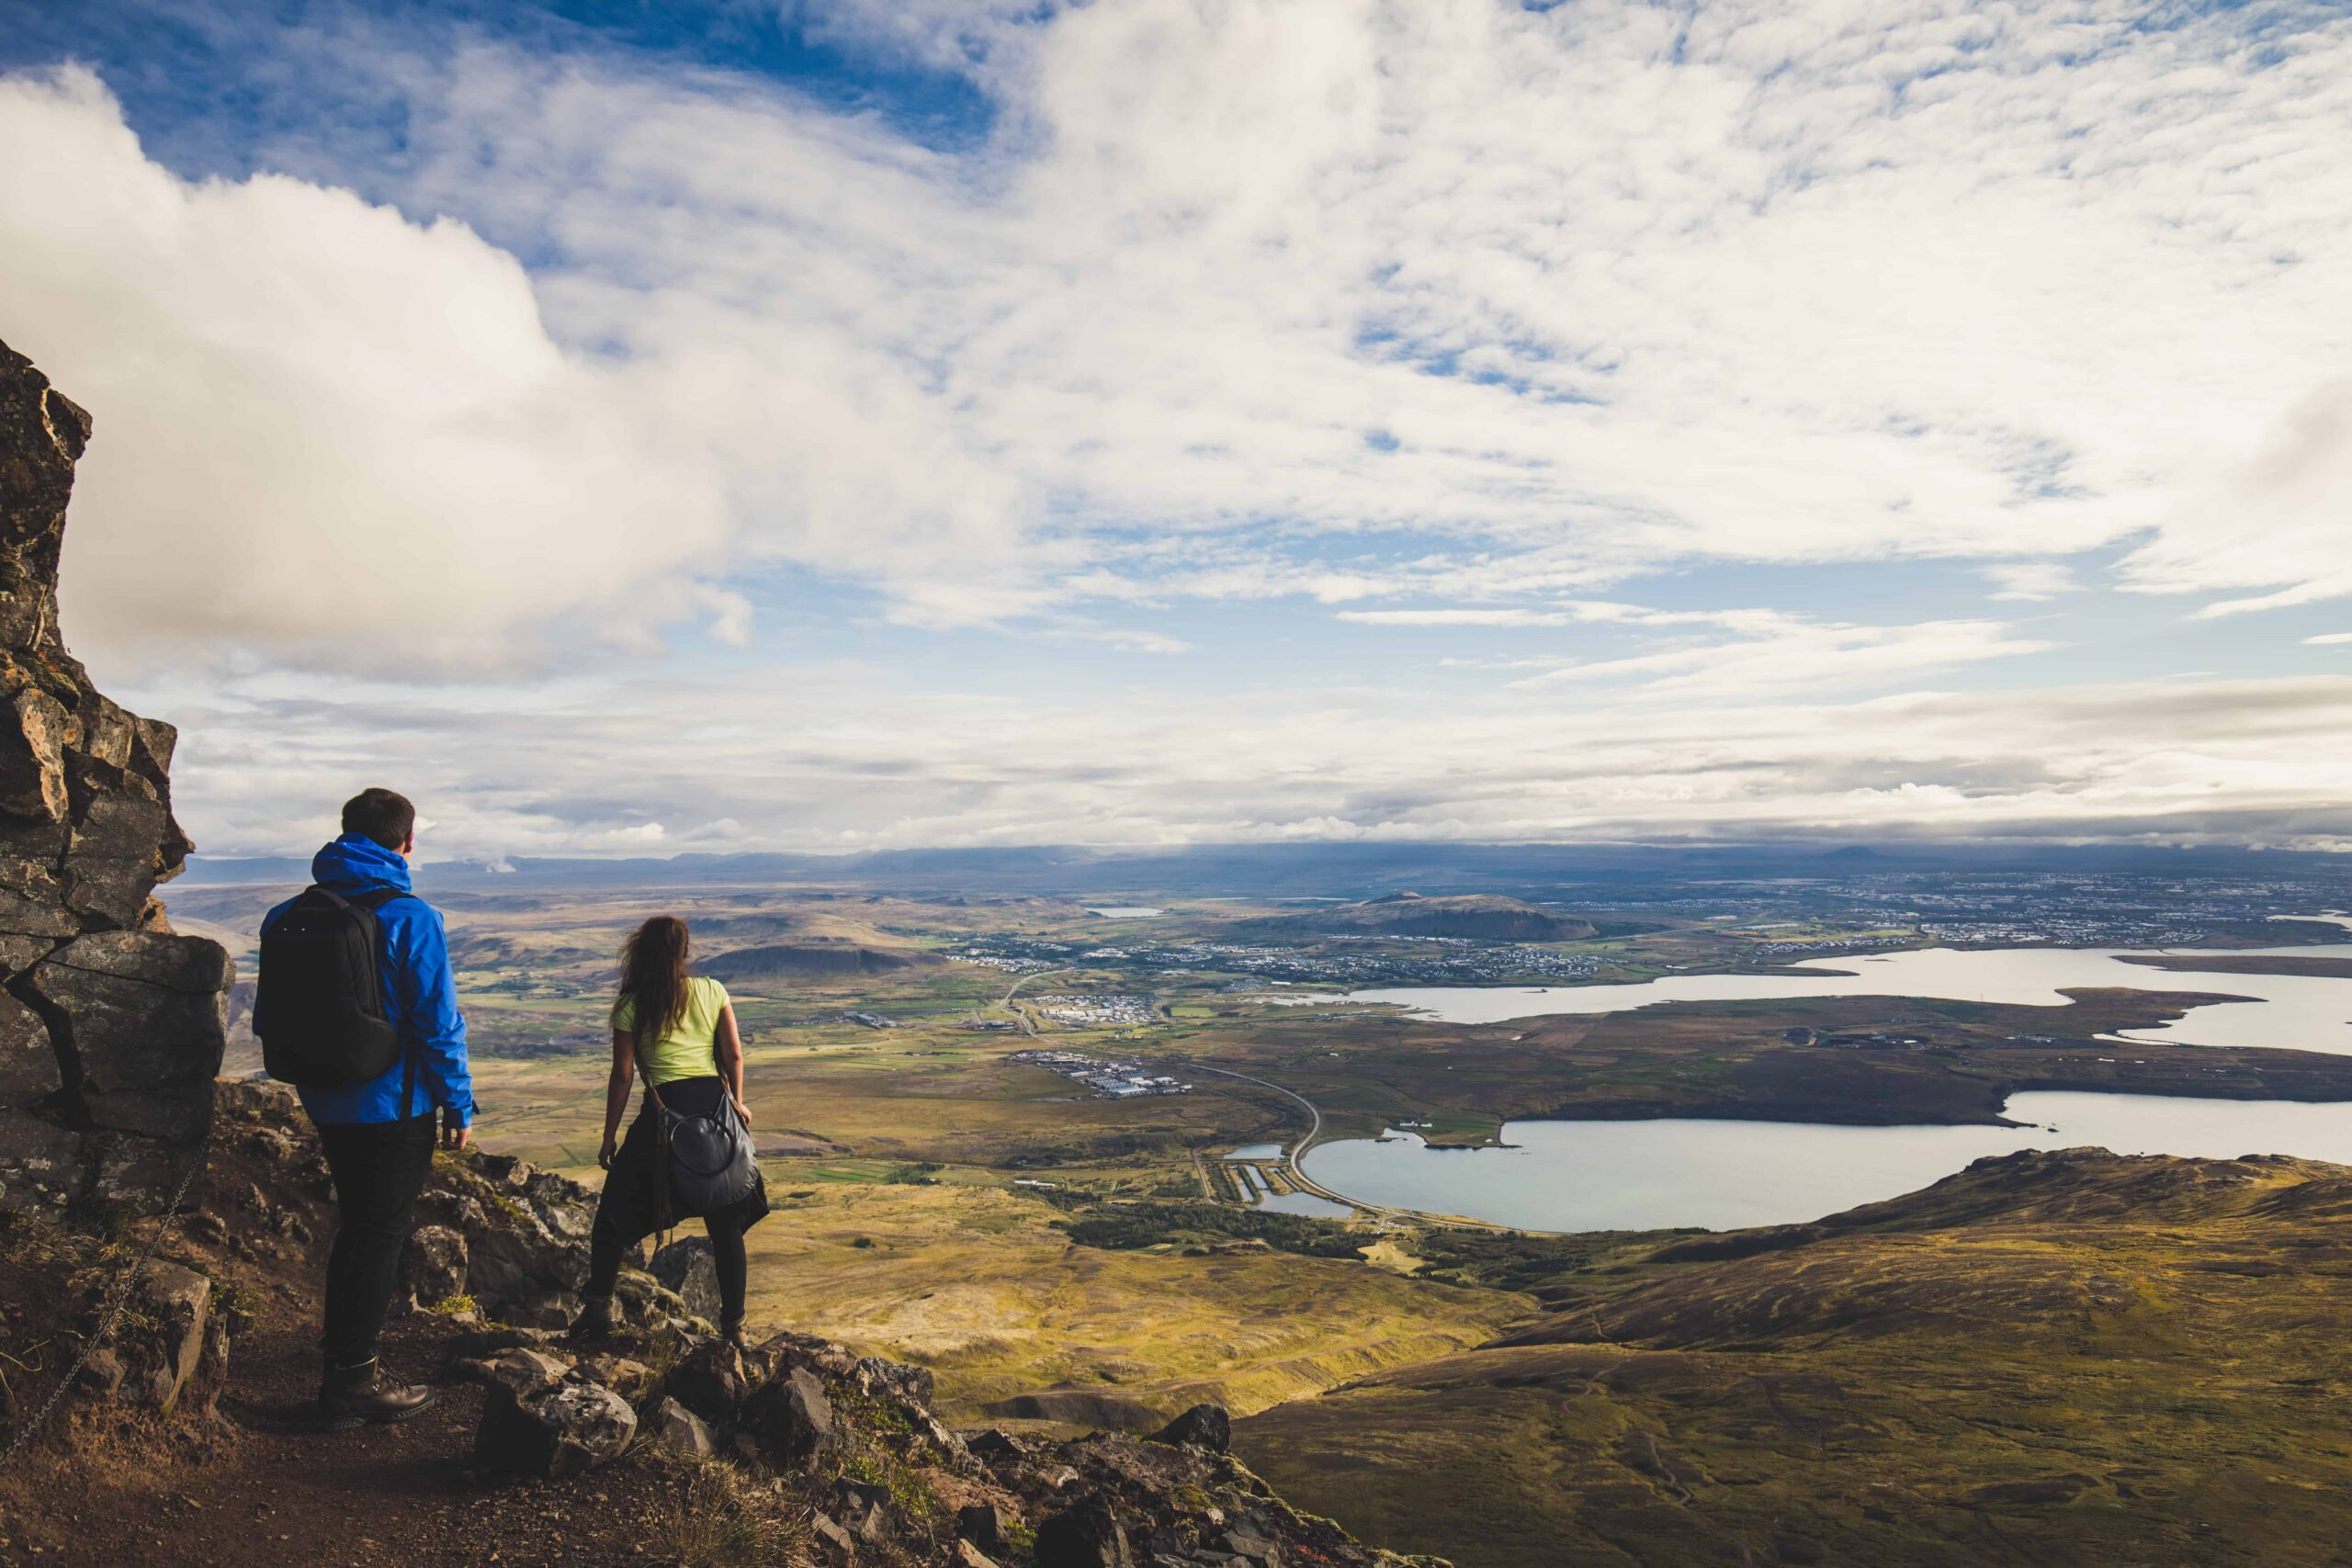 Honeymoon in Iceland, hiking on Esjan mountain with view over Reykjavik